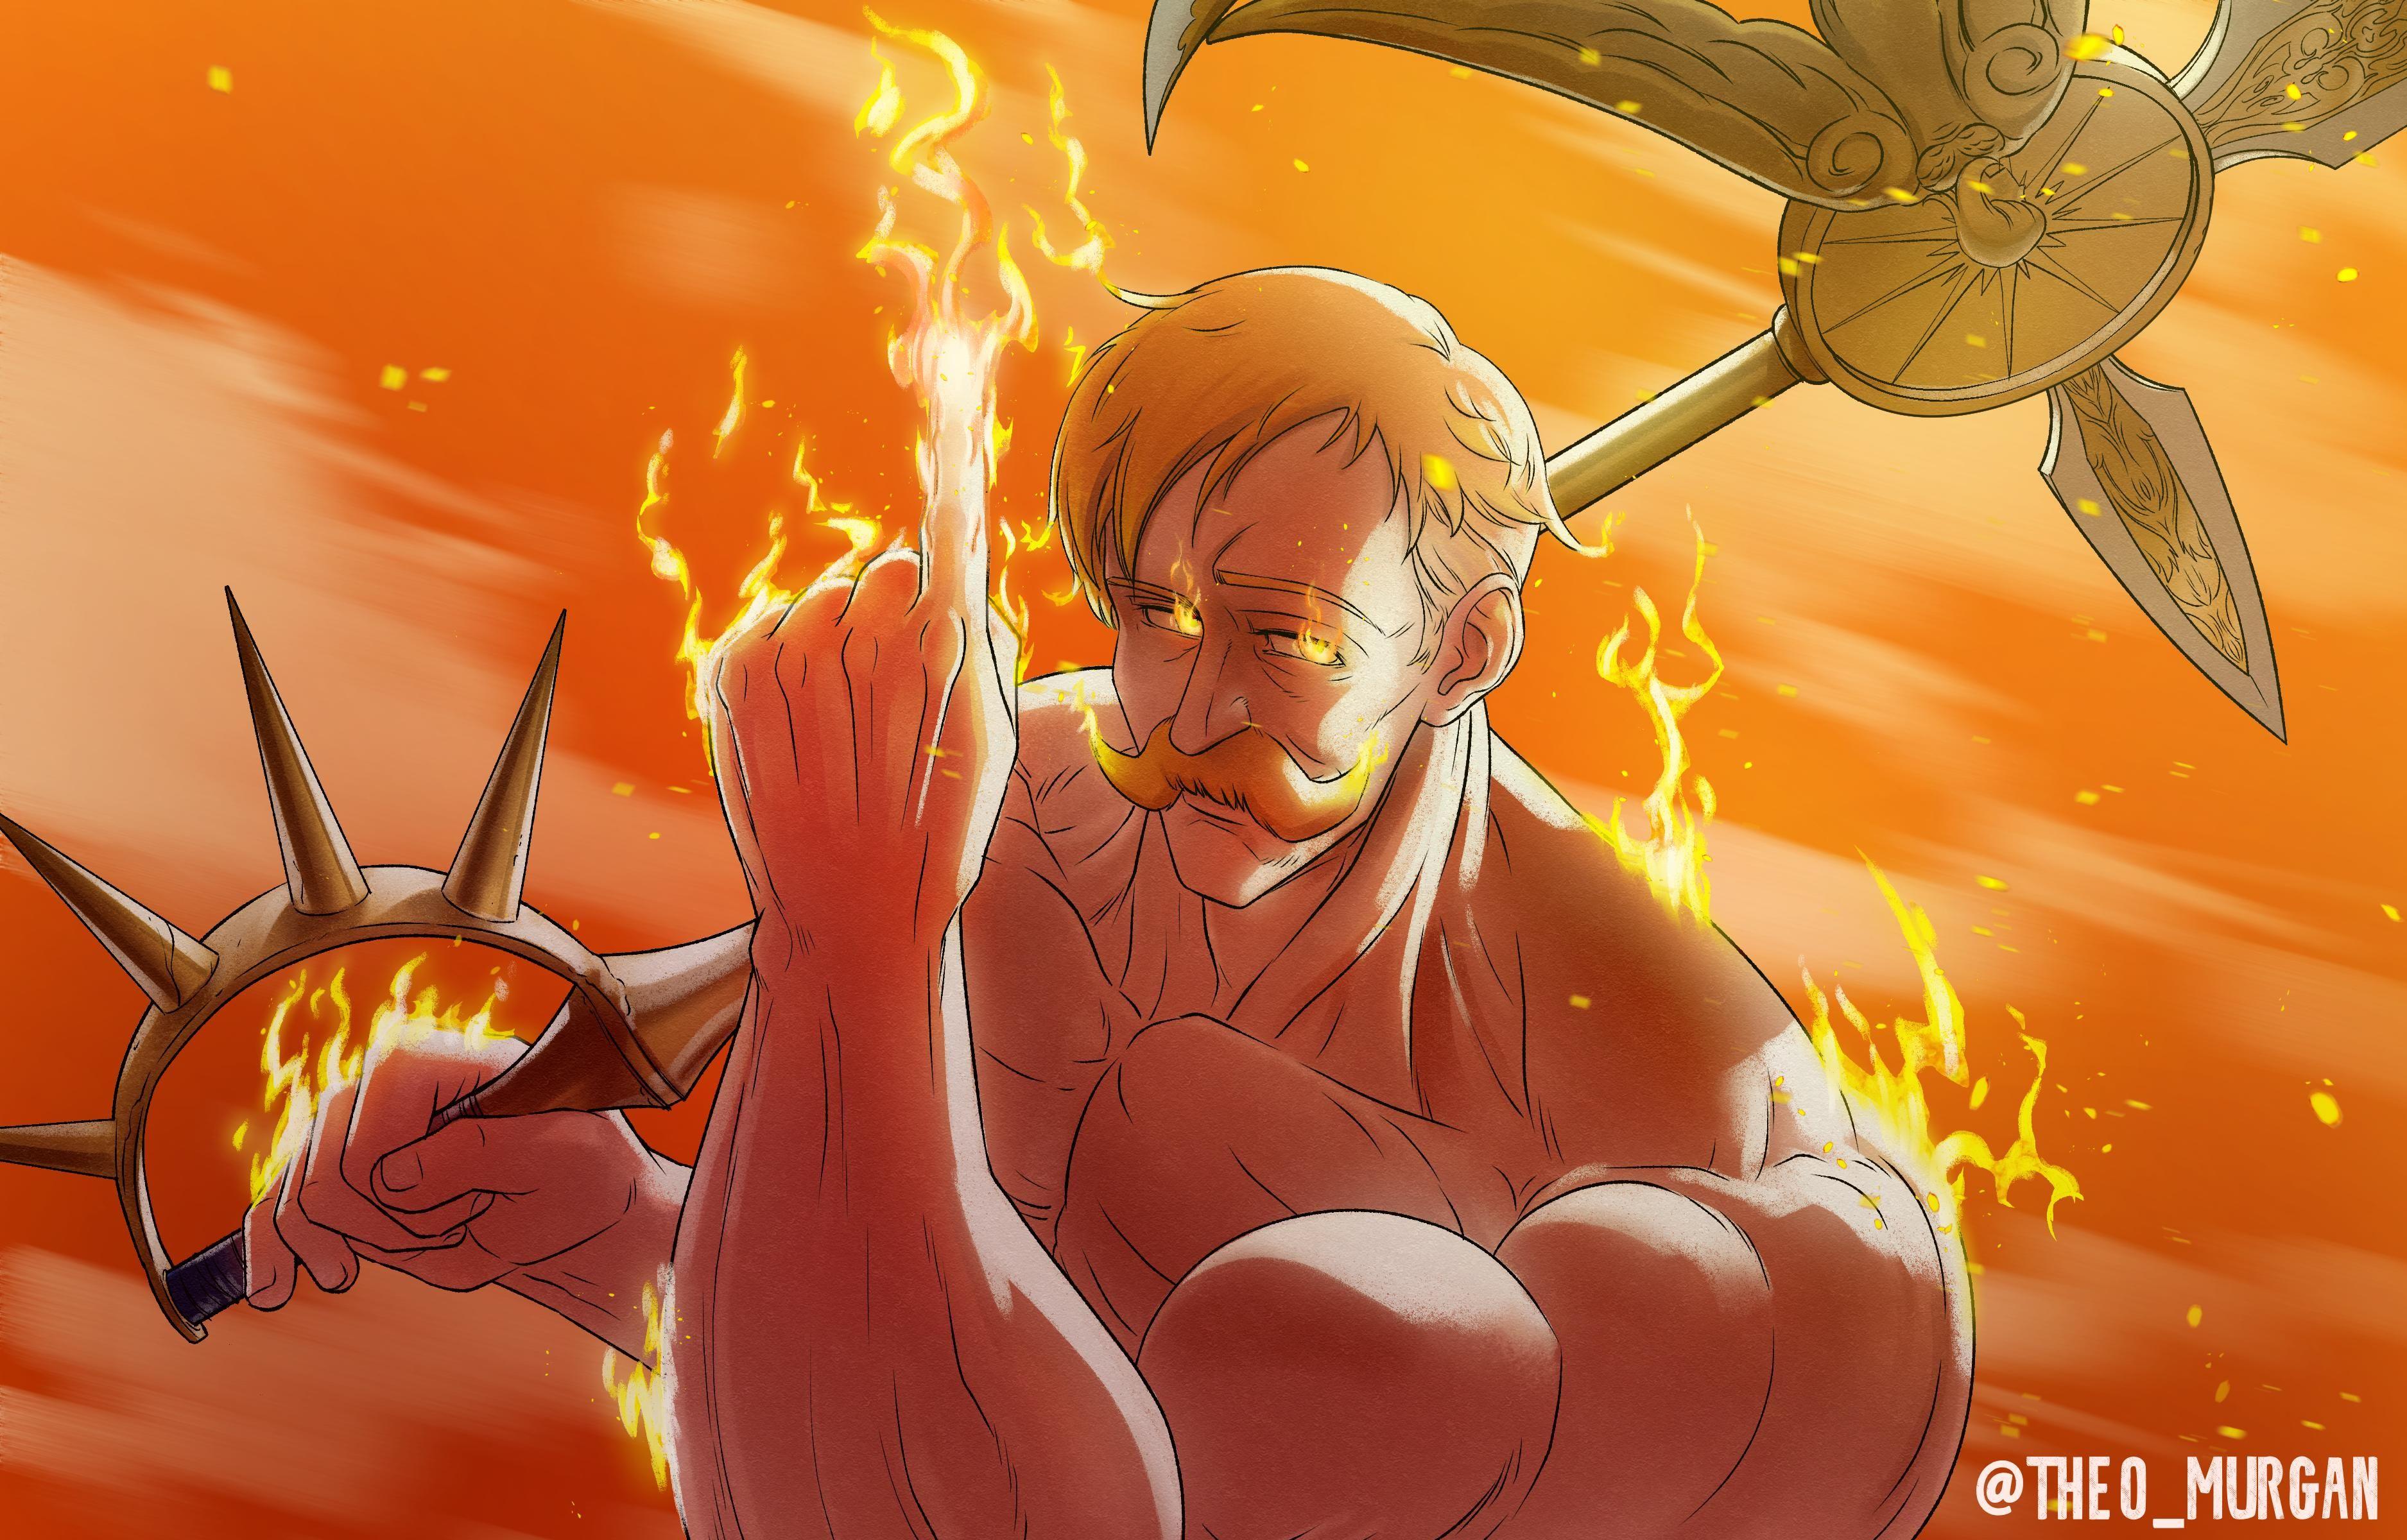 Drew Escanor Being A Badass Like Always Nanatsunotaizai Anime Heaven Seven Deadly Sins Anime Anime Wallpaper